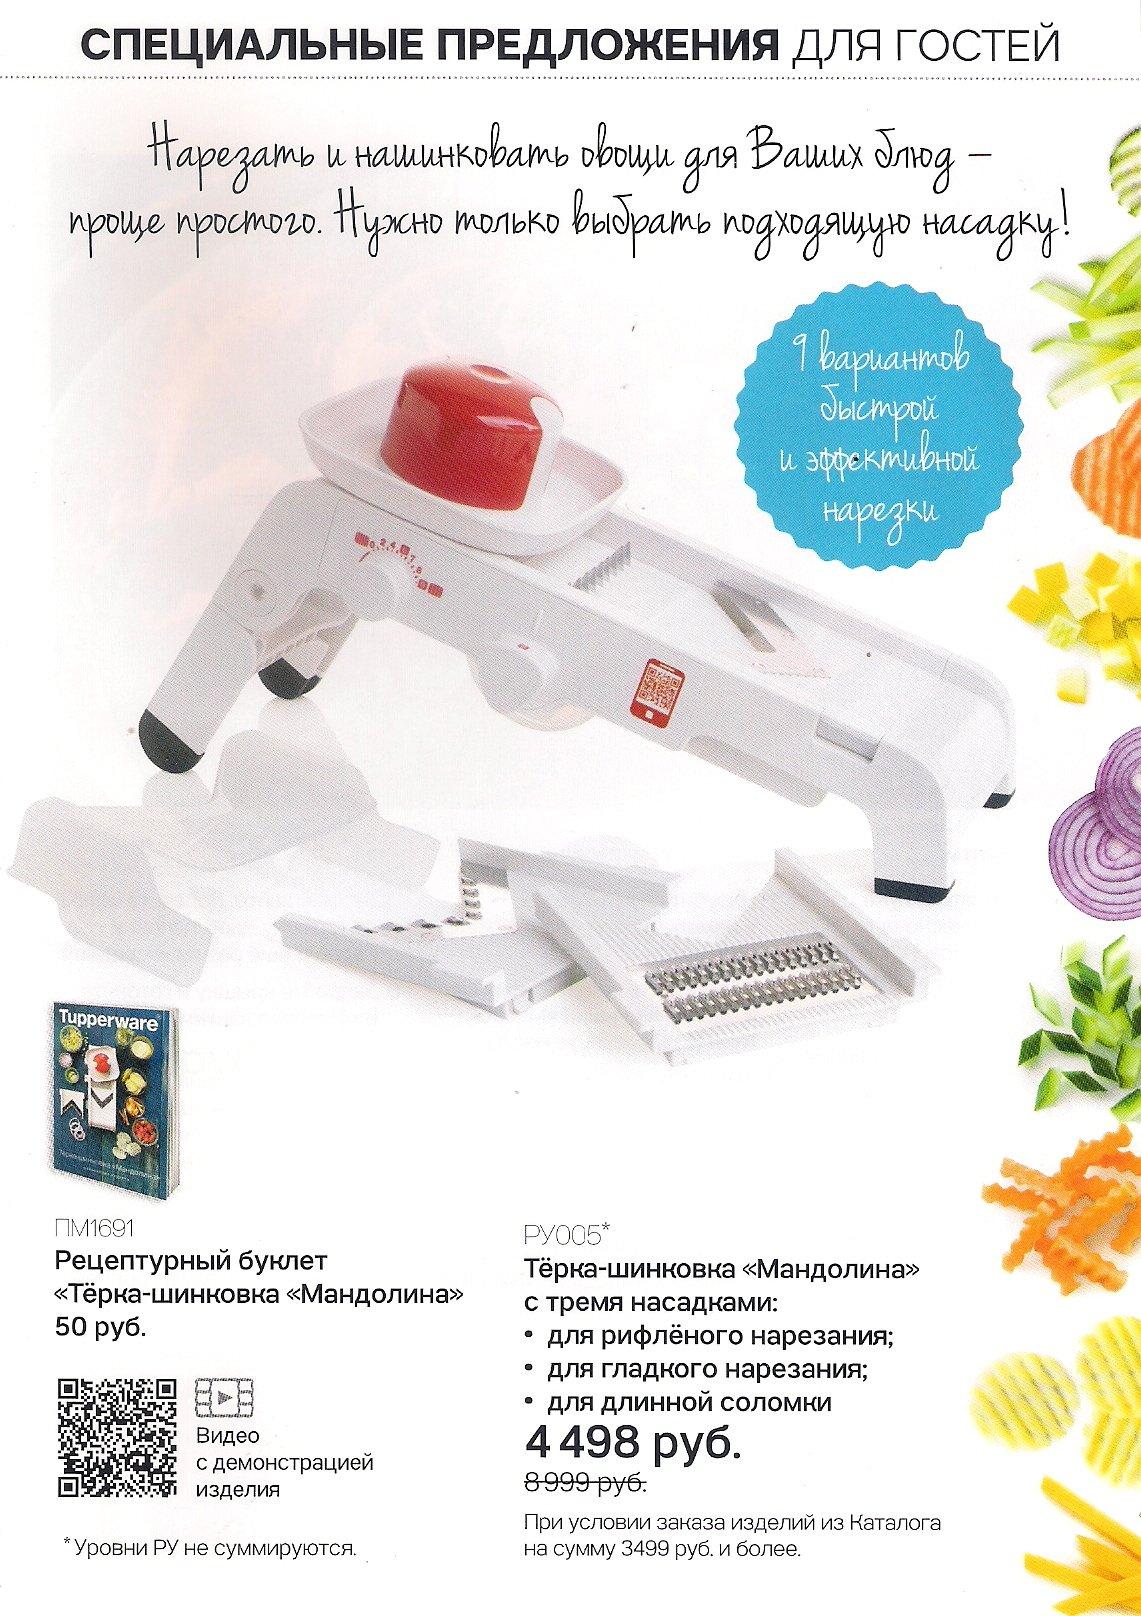 https://tupperware-online.ru/images/upload/11g.jpg